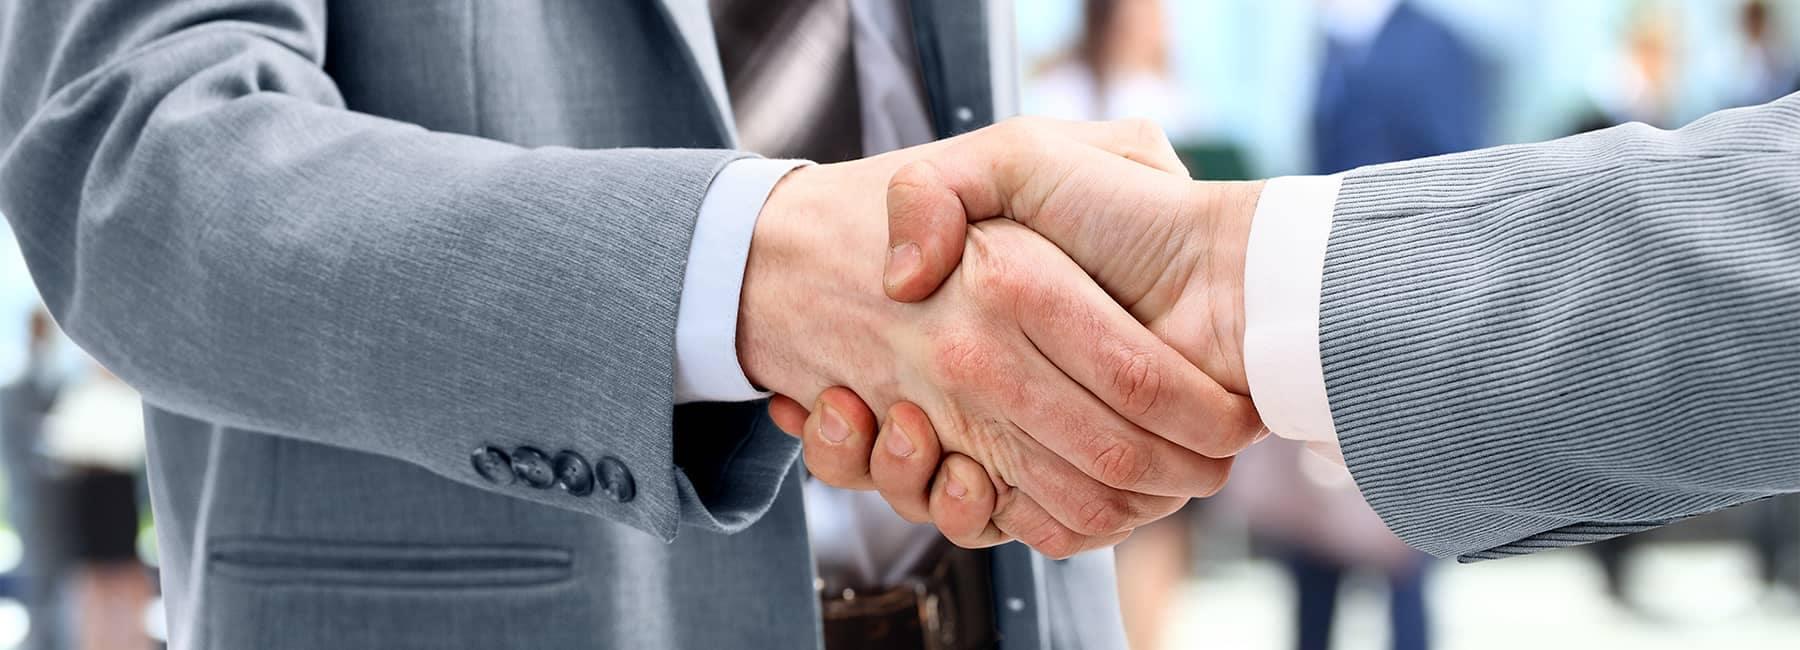 Businessmen Shaking HandsBusinessmen Shaking Hands